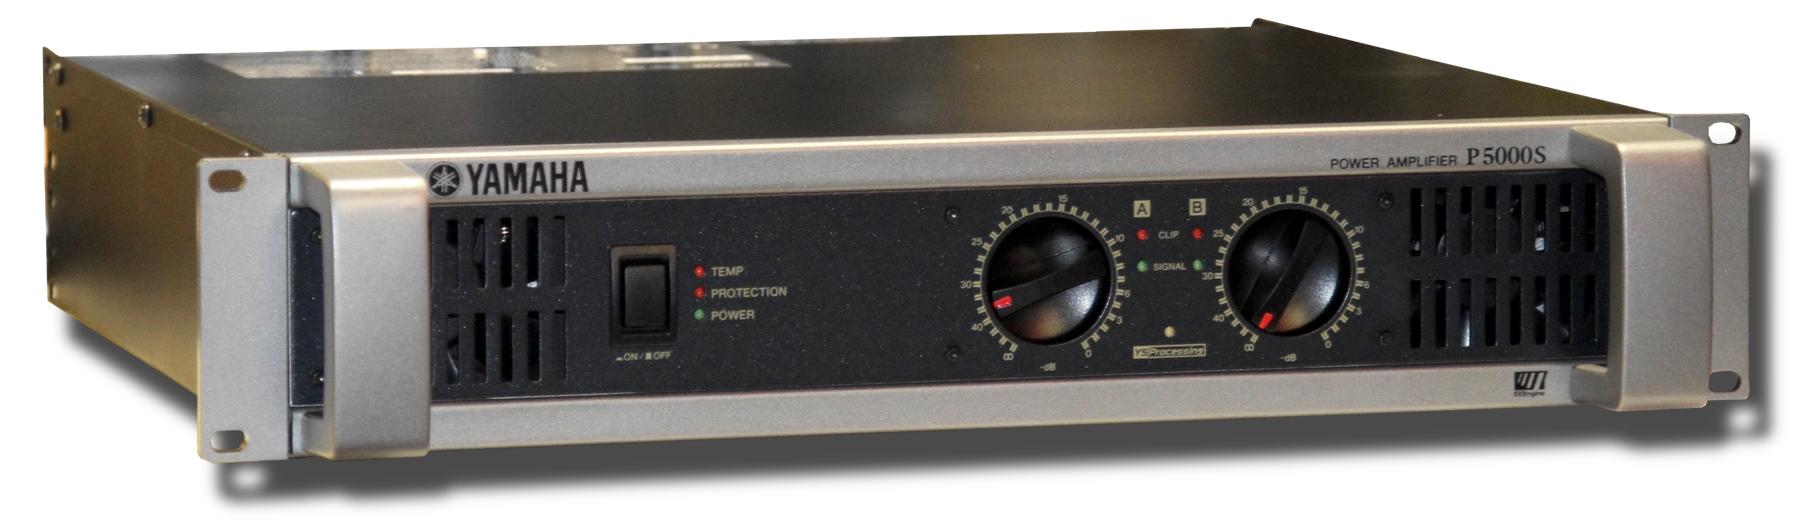 rock factory power amps yamaha p5000s. Black Bedroom Furniture Sets. Home Design Ideas